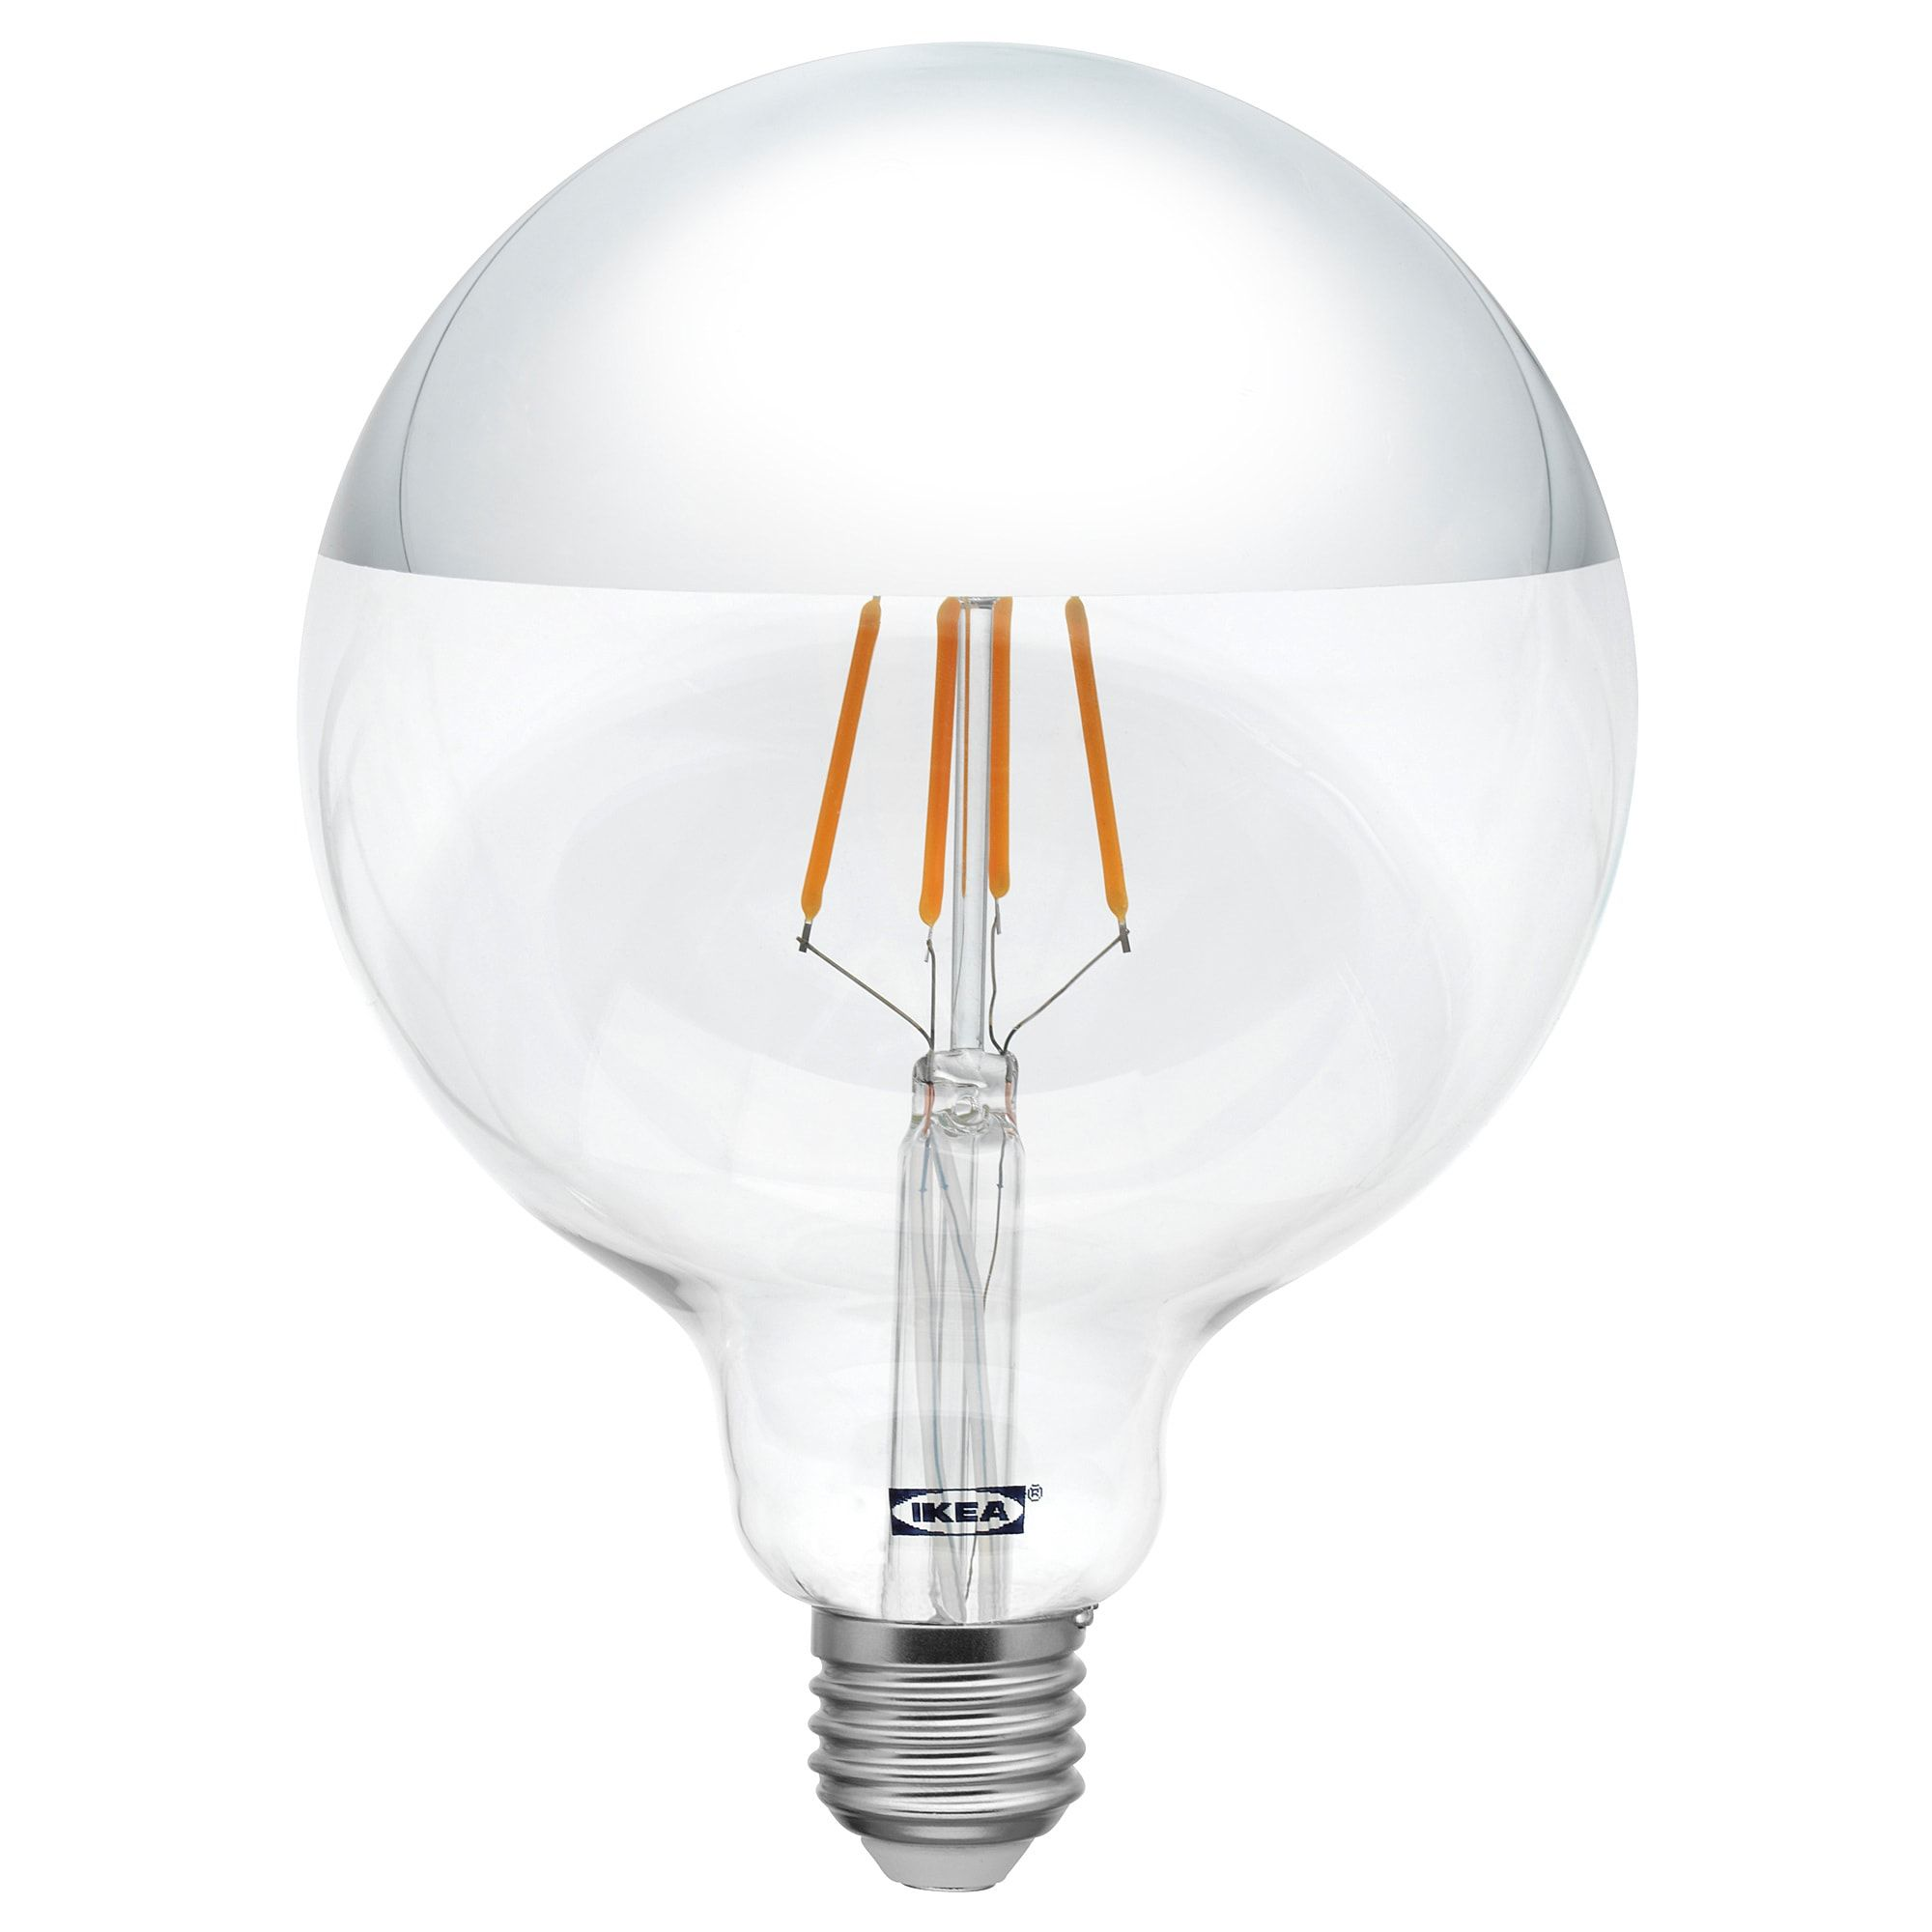 Sillbo Led Bulbs Ikea Led Leuchtmittel Leuchtmittel E27 Leuchtmittel